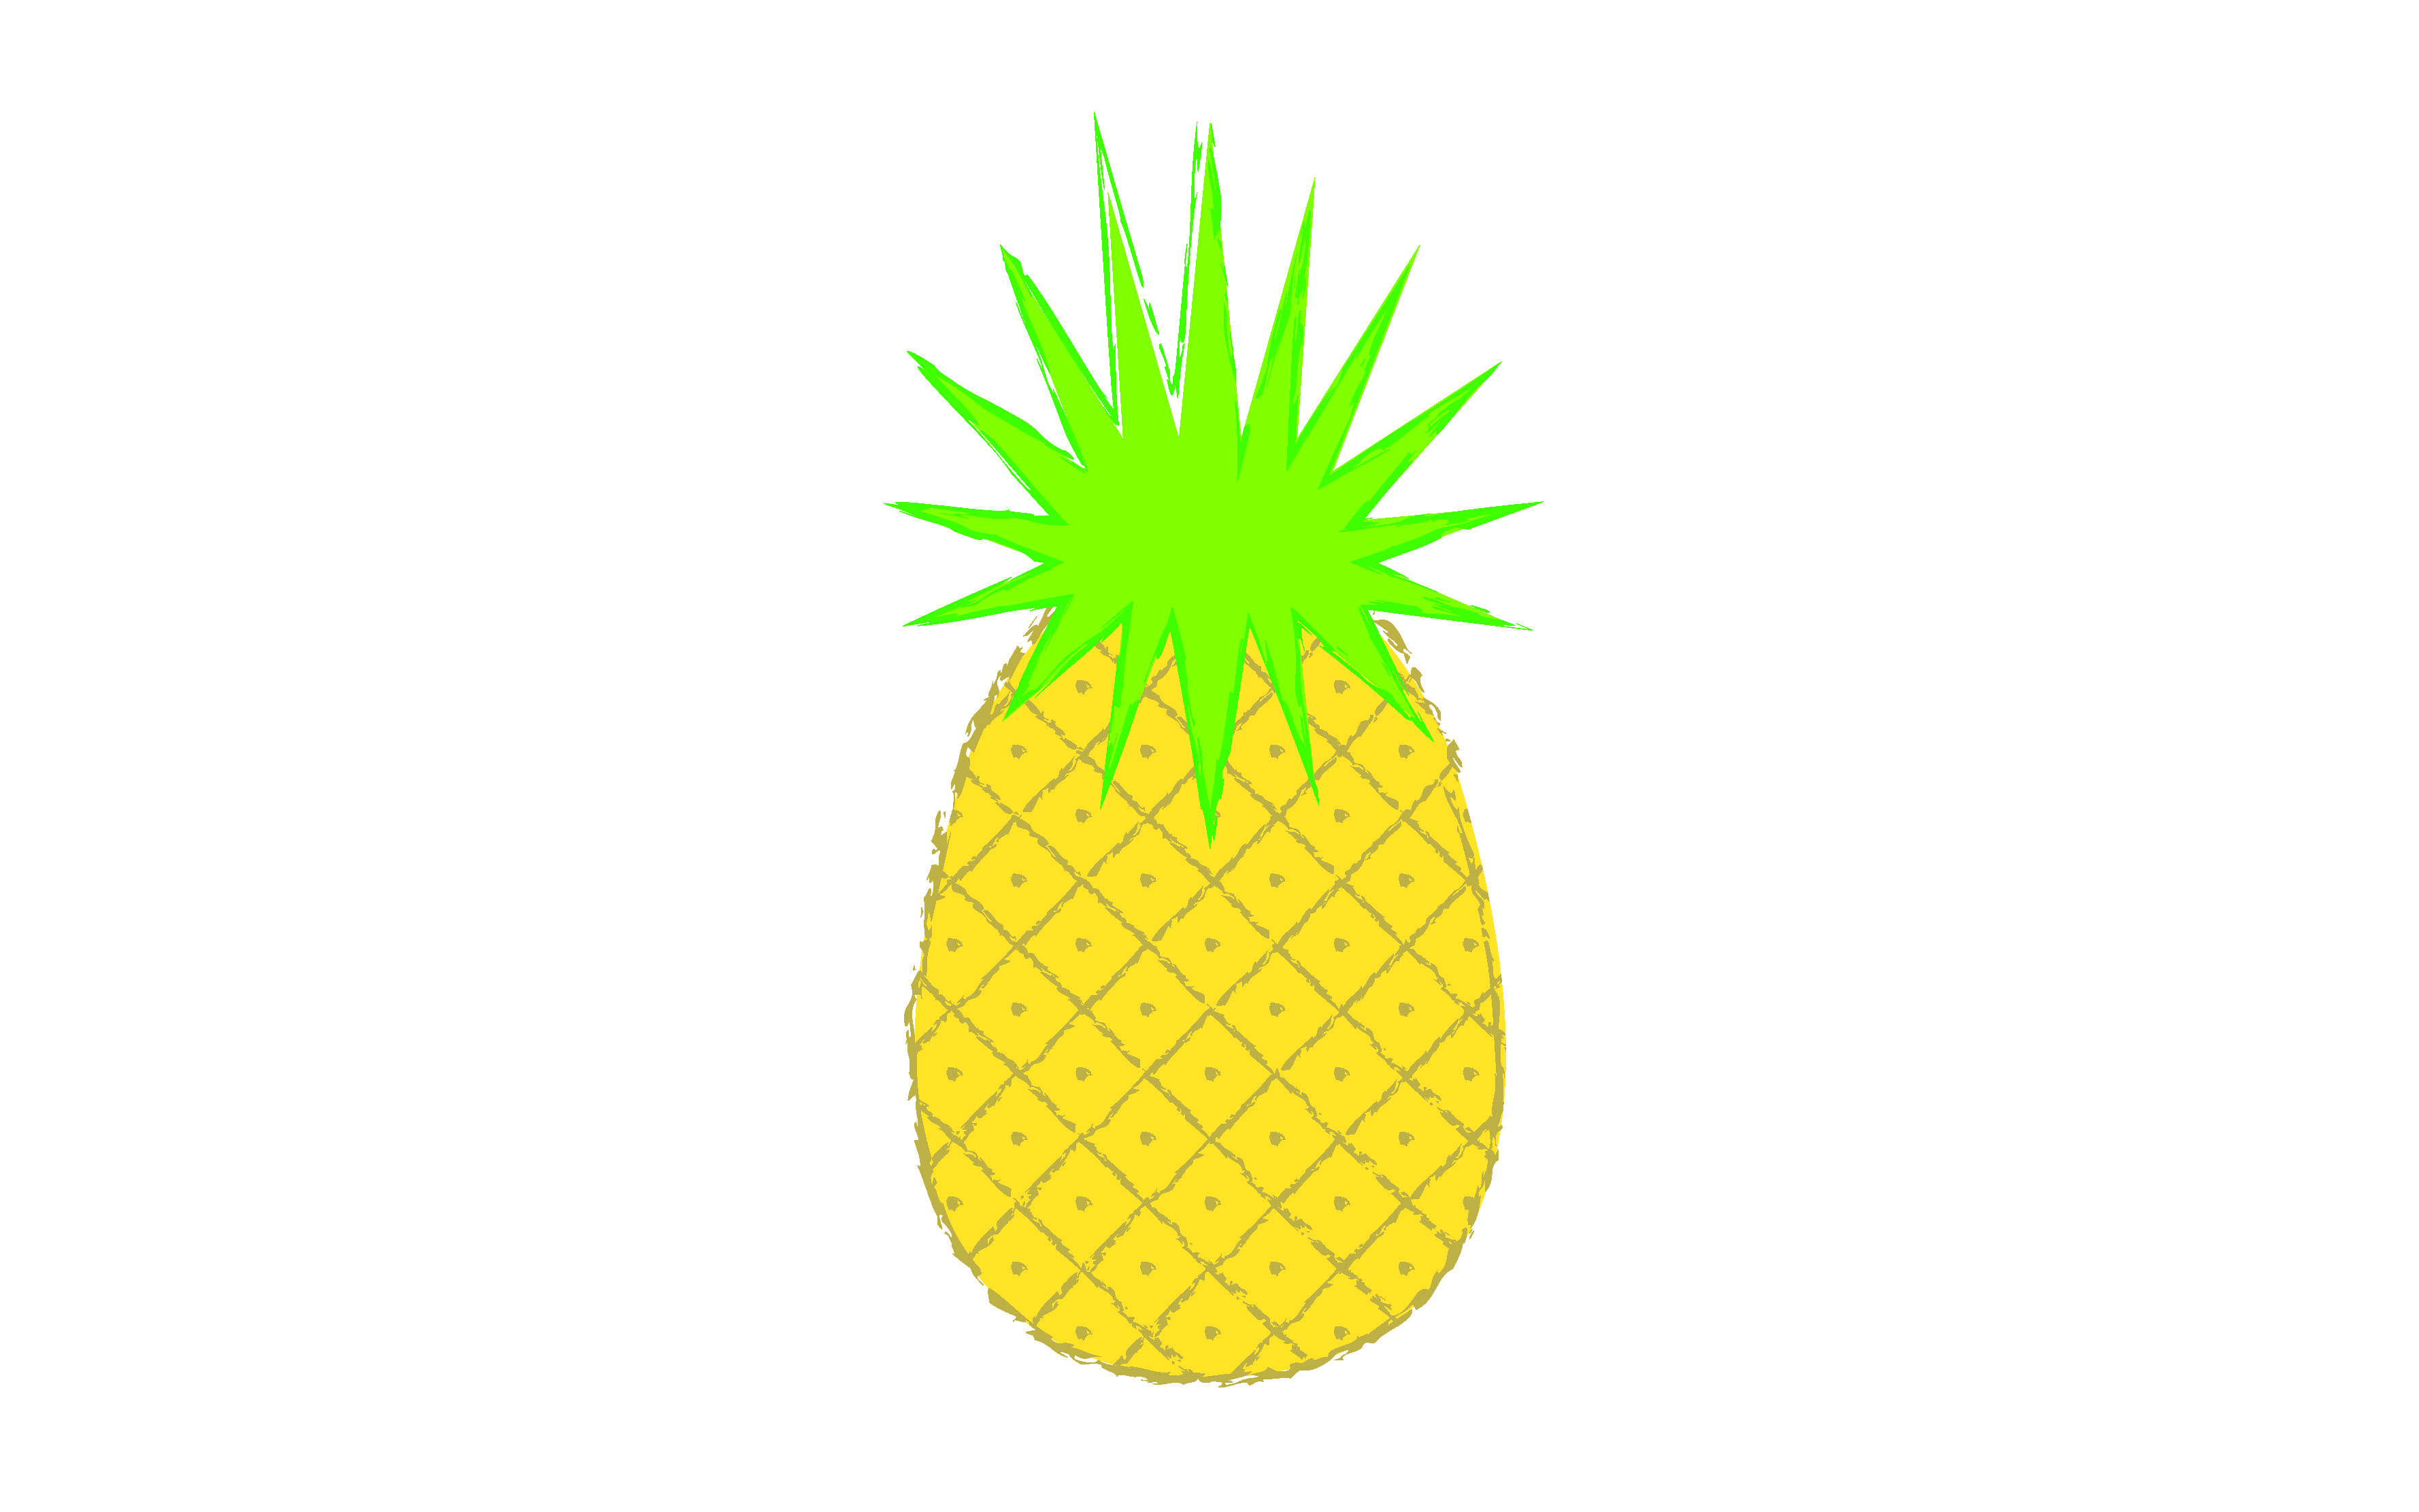 pineapple desktop wallpaper - photo #31